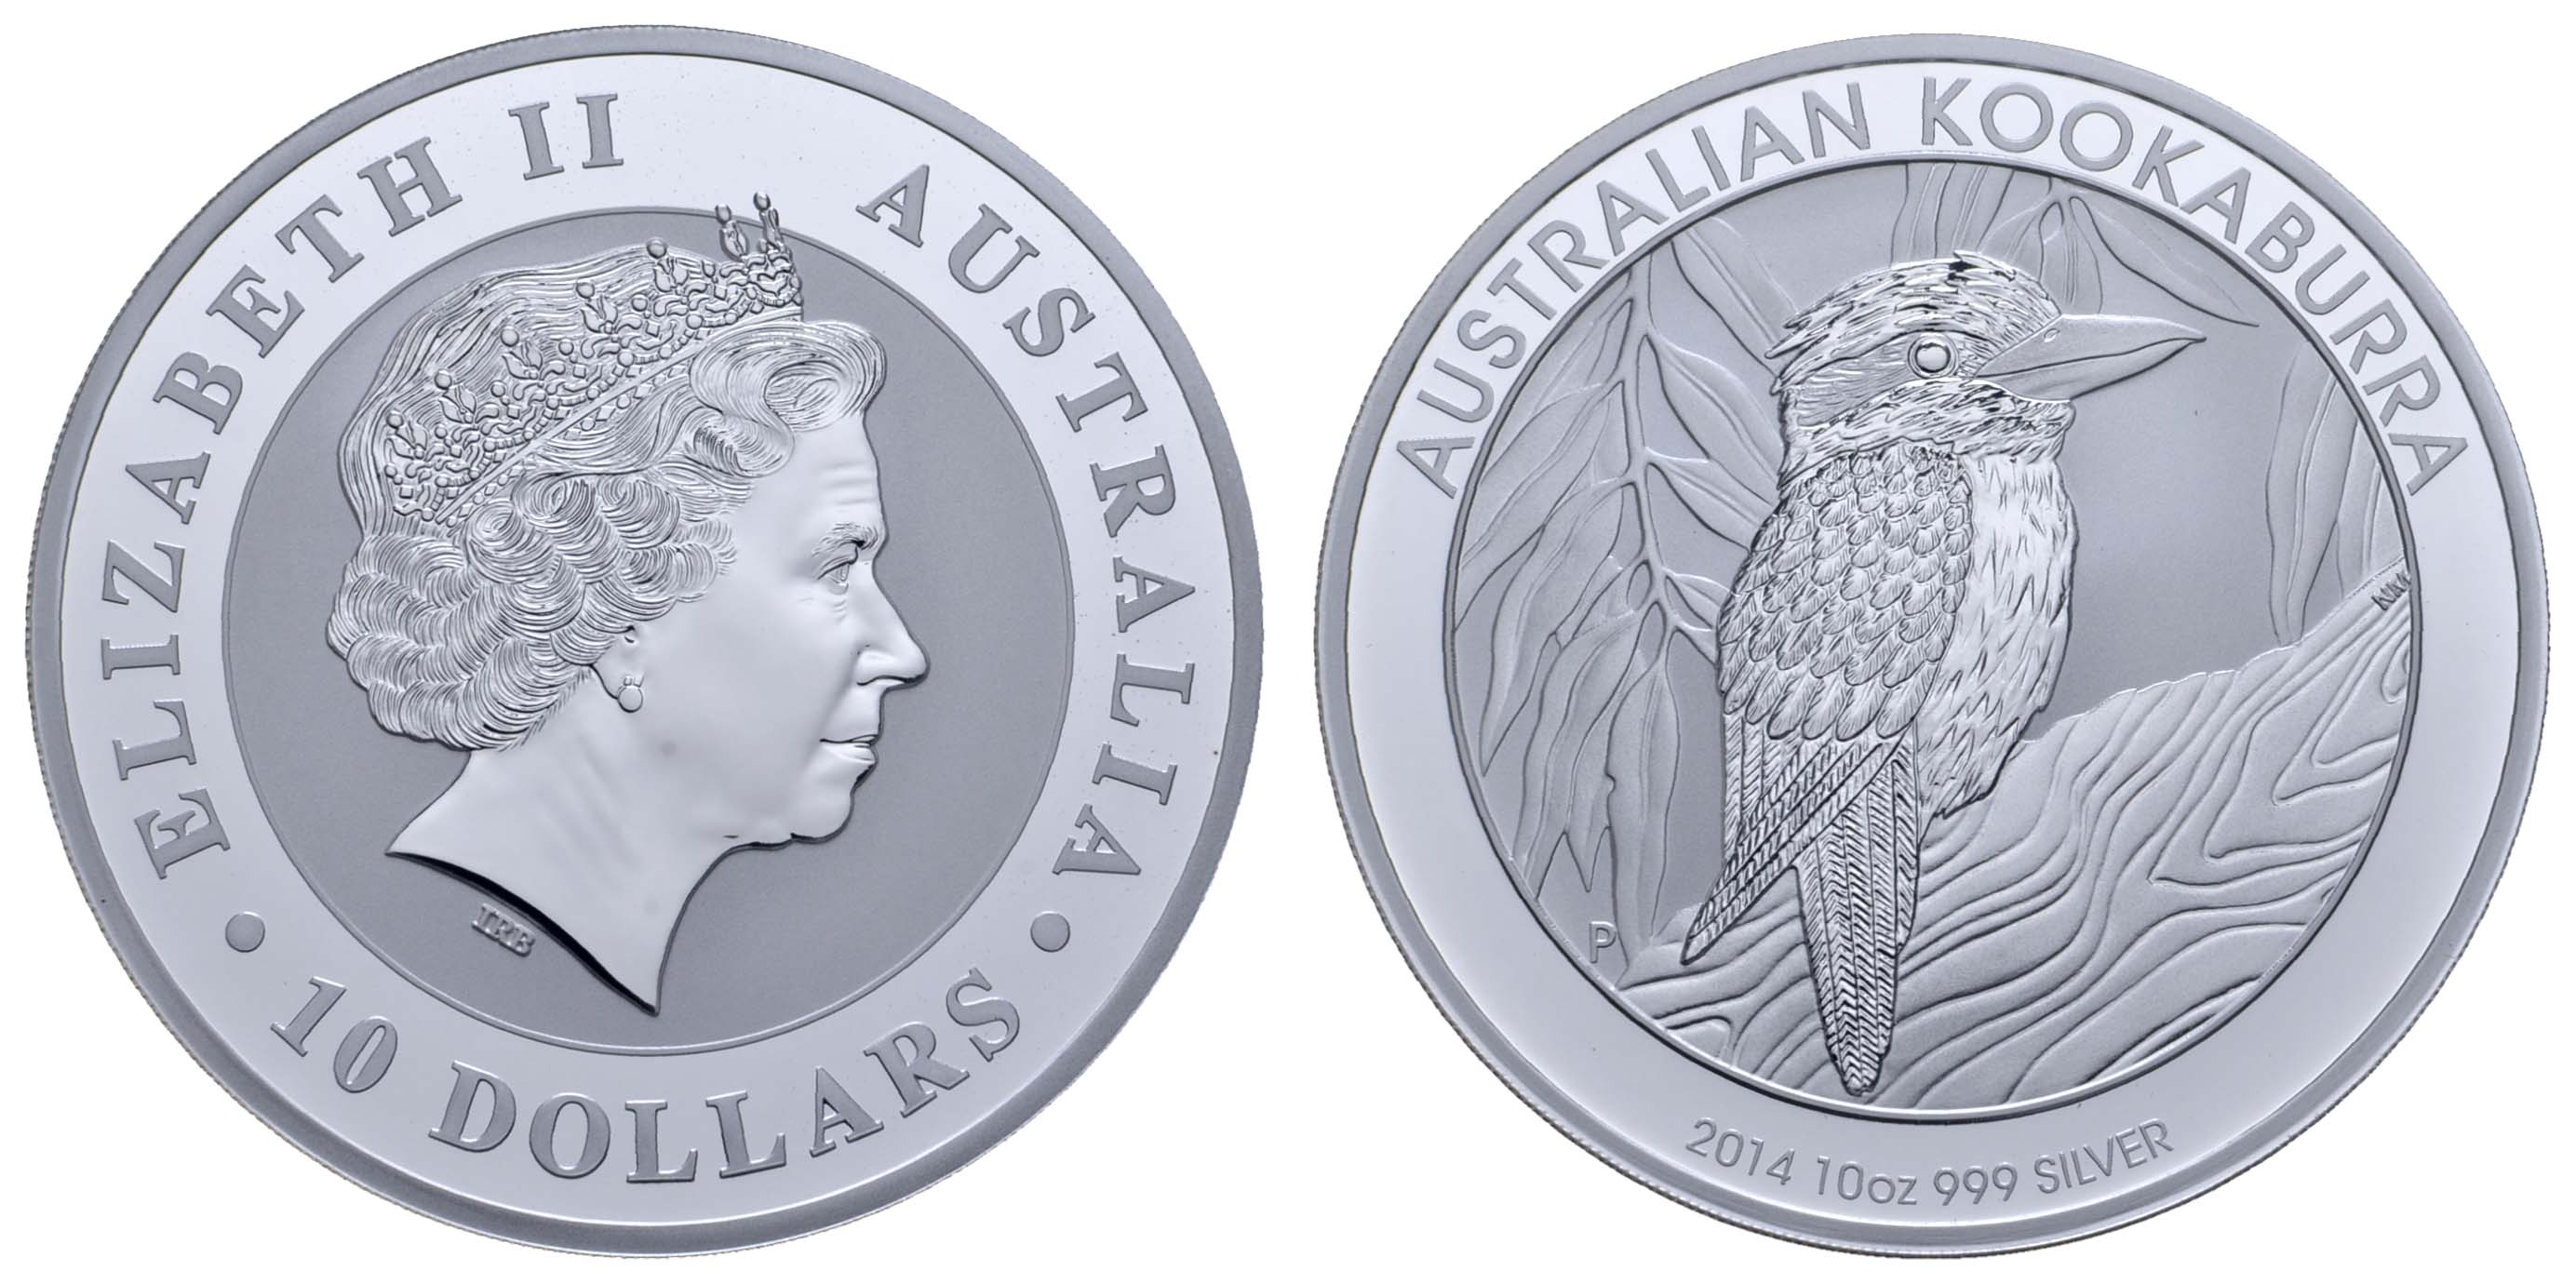 Lot 1872 - übersee australien -  Auktionshaus Ulrich Felzmann GmbH & Co. KG Coins single lots